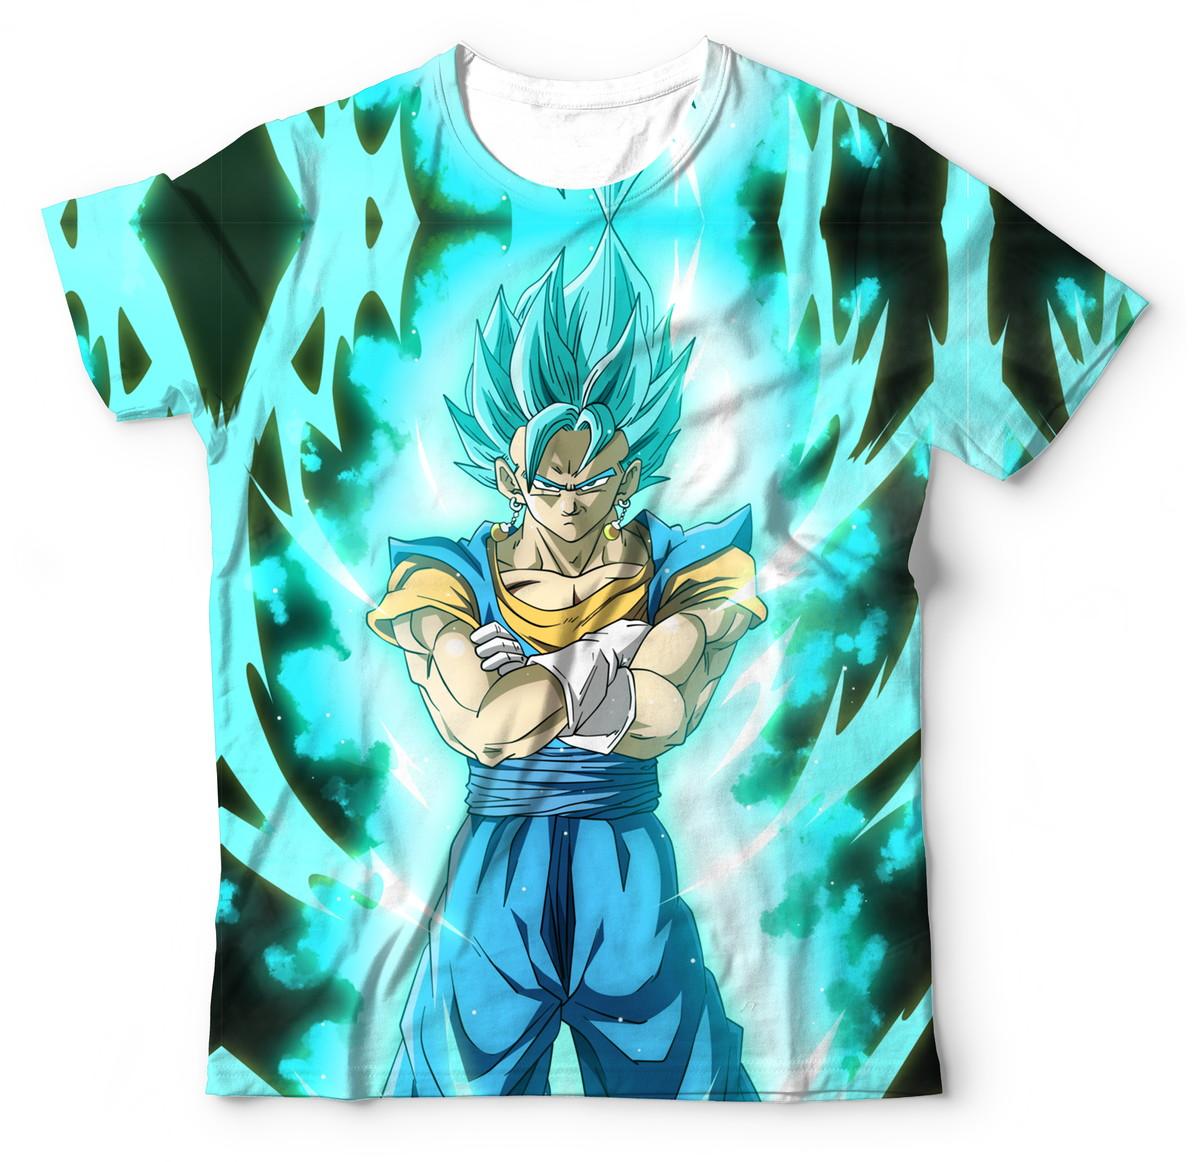 8065b45371 Camisa Camiseta Blusa Dragon Ball Super Vegetto Blue DBZ no Elo7 ...